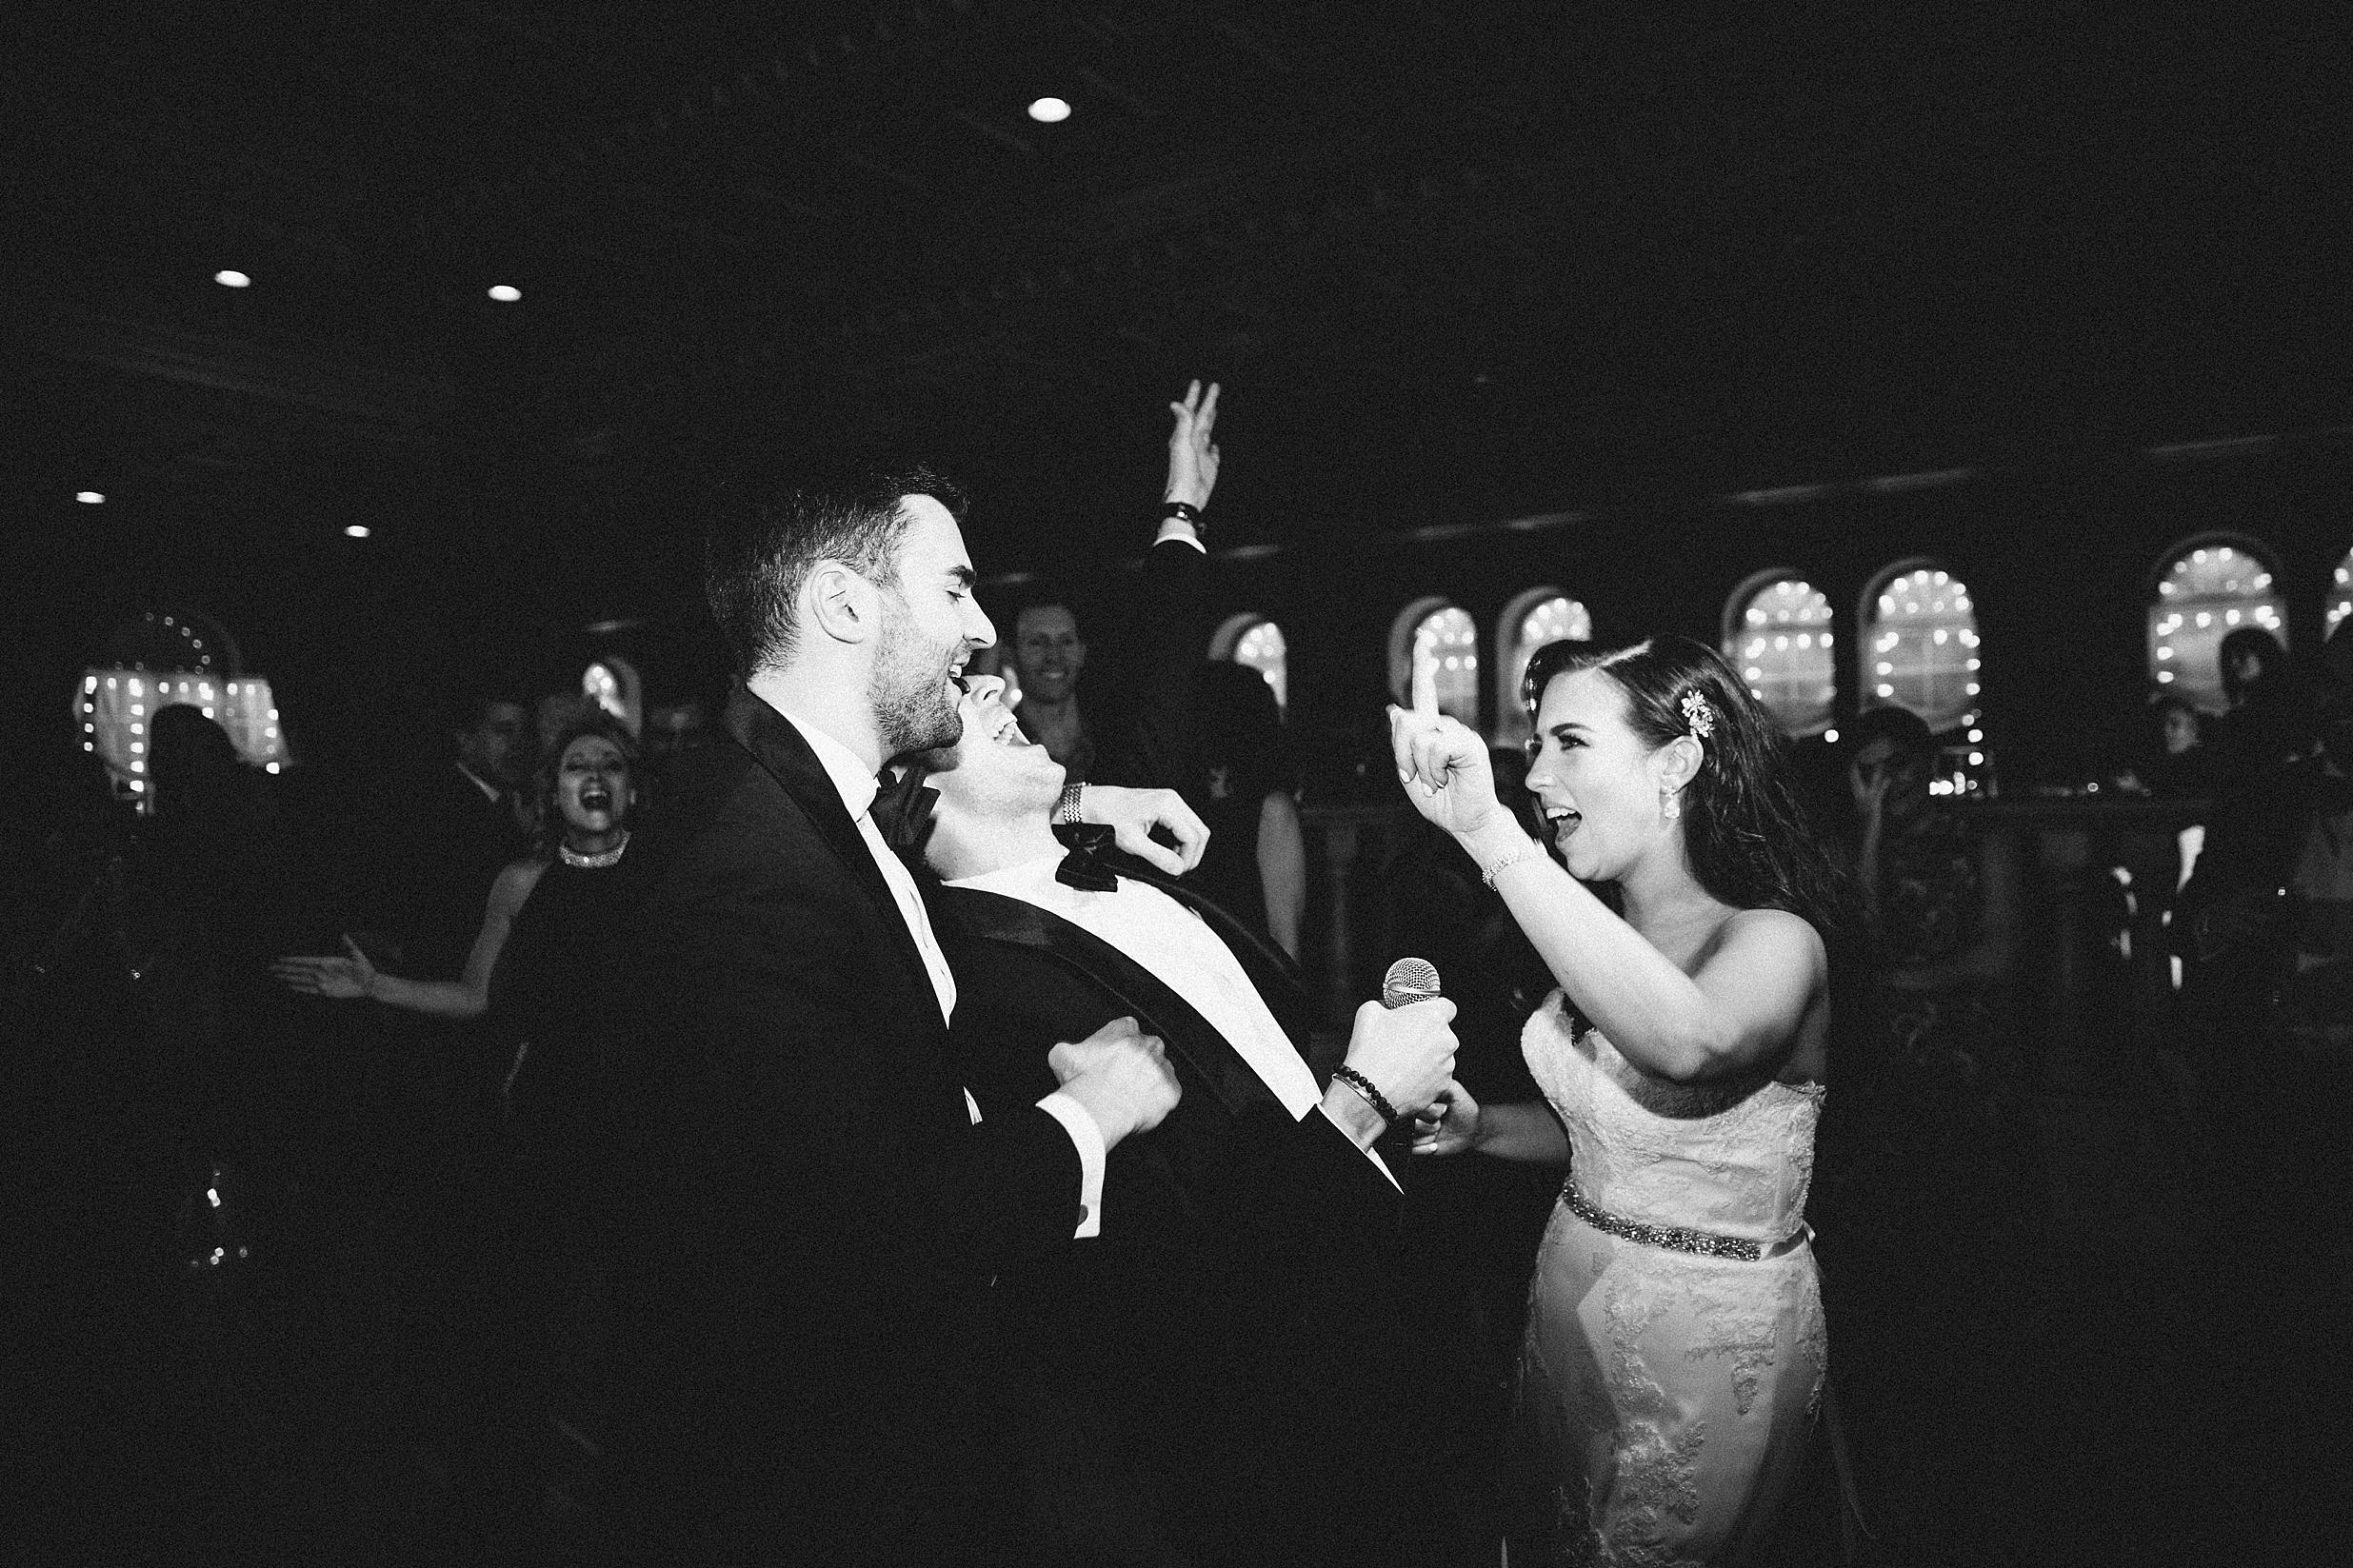 winter-wedding-snow-indoor-ceremony-nj-photographer_0047.jpg